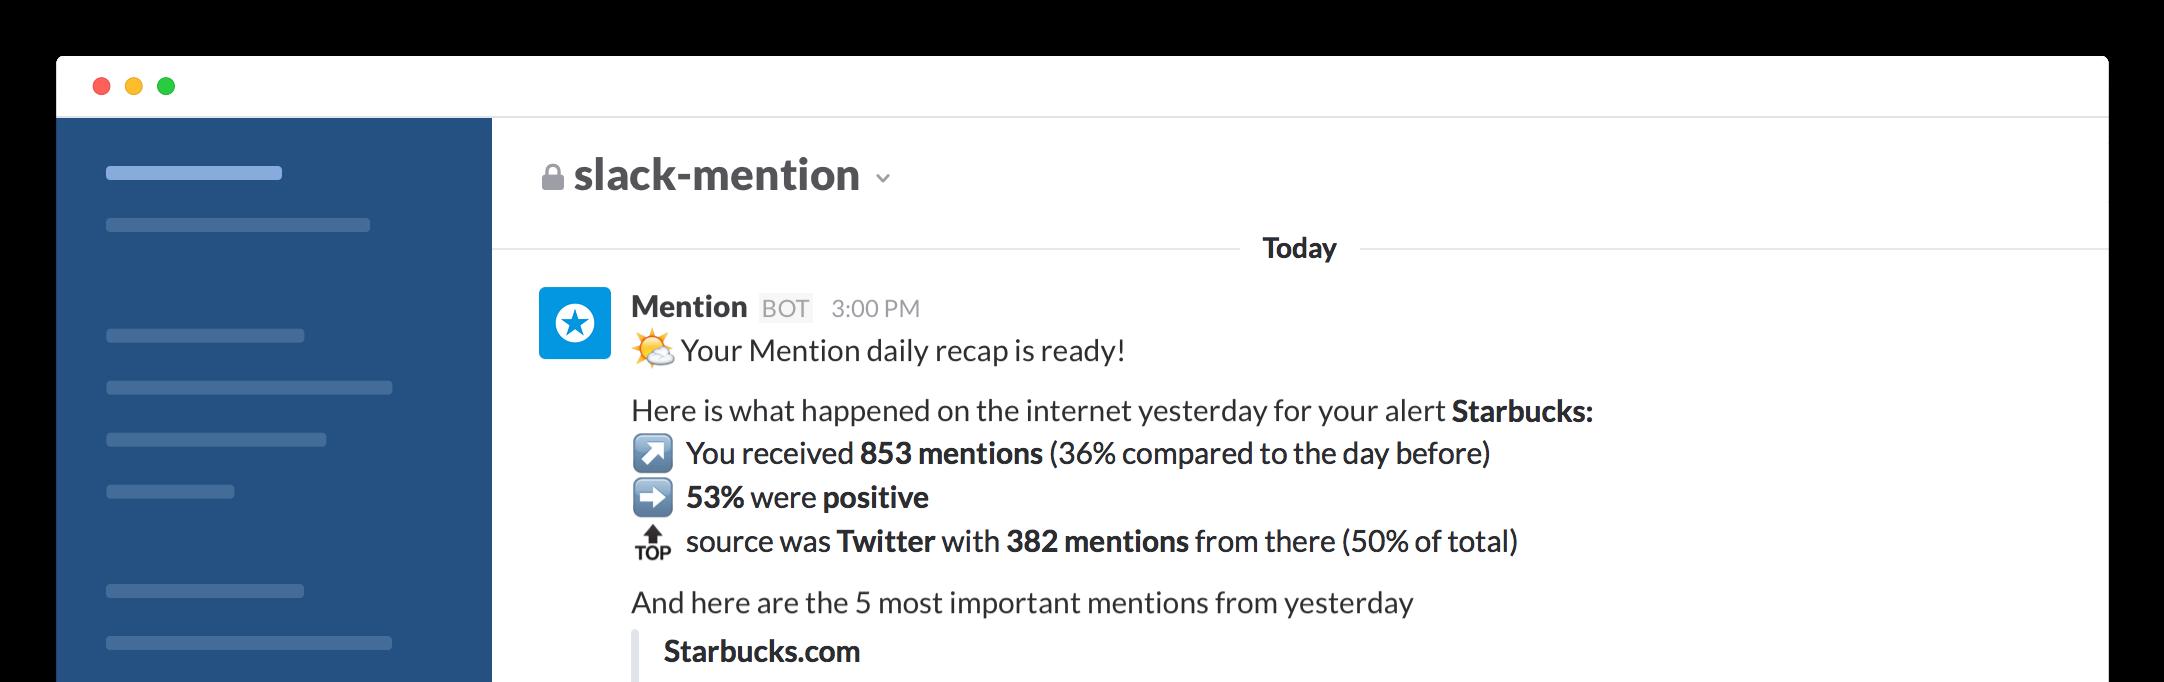 social mentions on slack